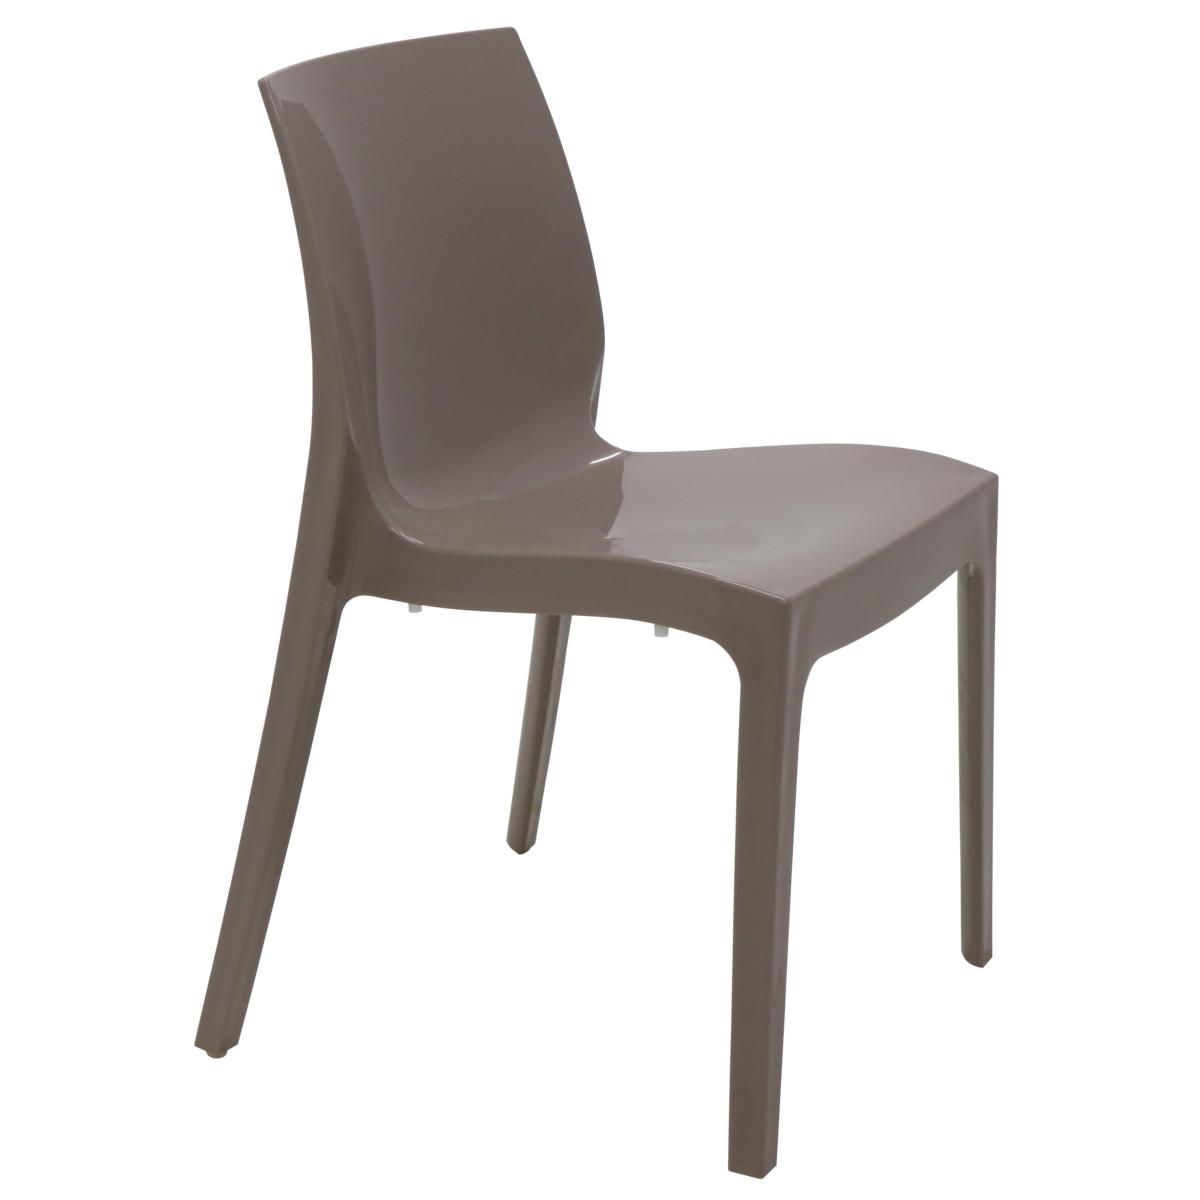 Cadeira Tramontina Alice Camurça 92037/210 1 Peça